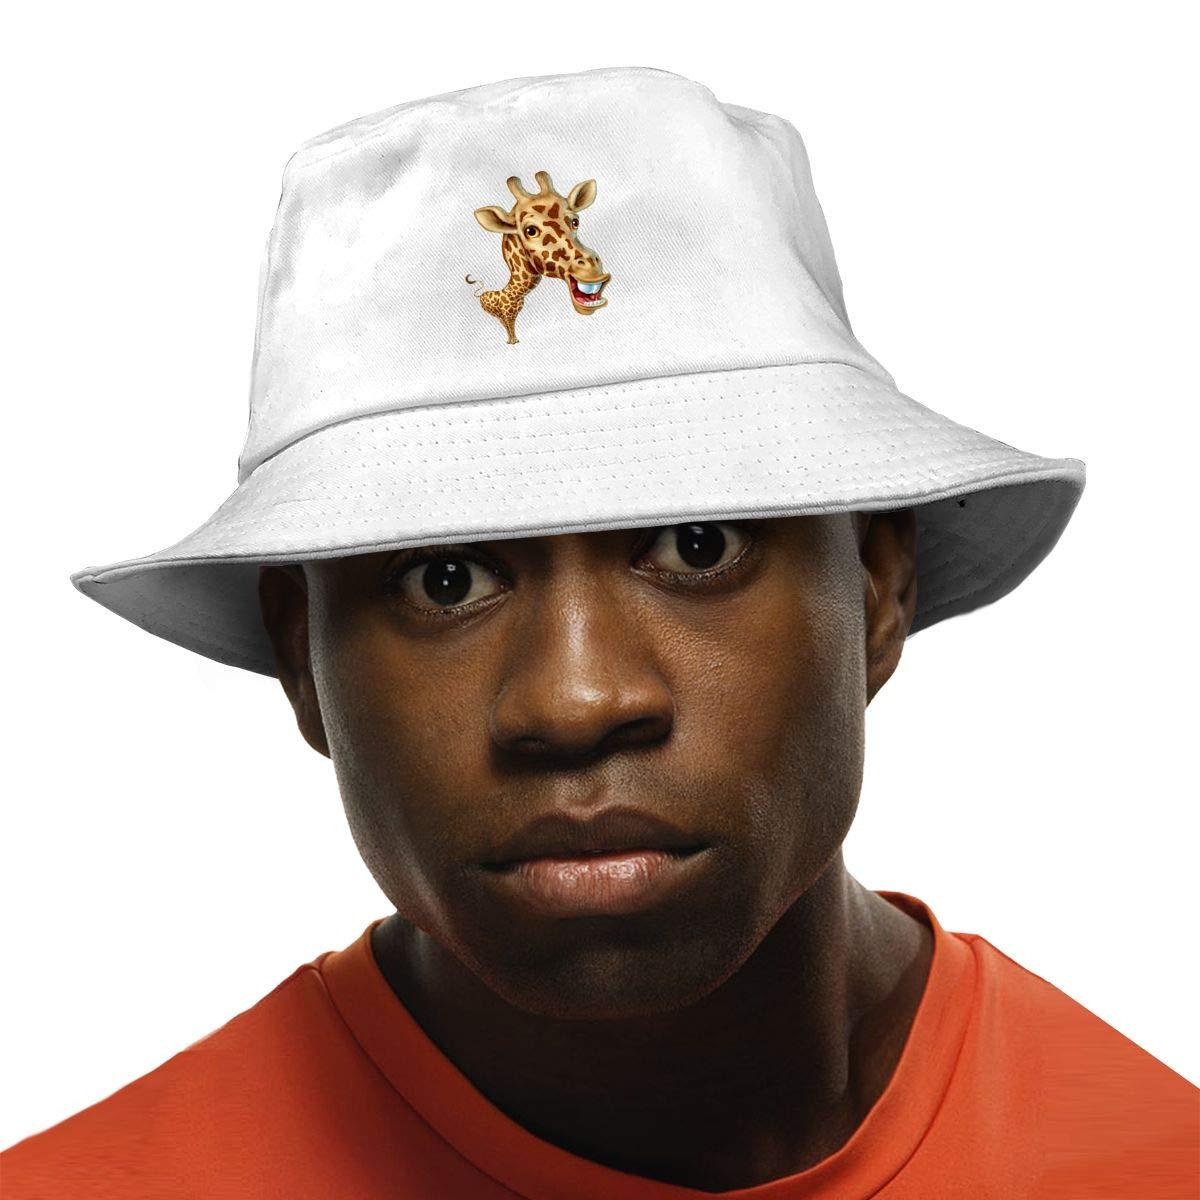 PPAN Funny Deer Unisex Cotton Packable White Travel Bucket Hat Fishing Cap